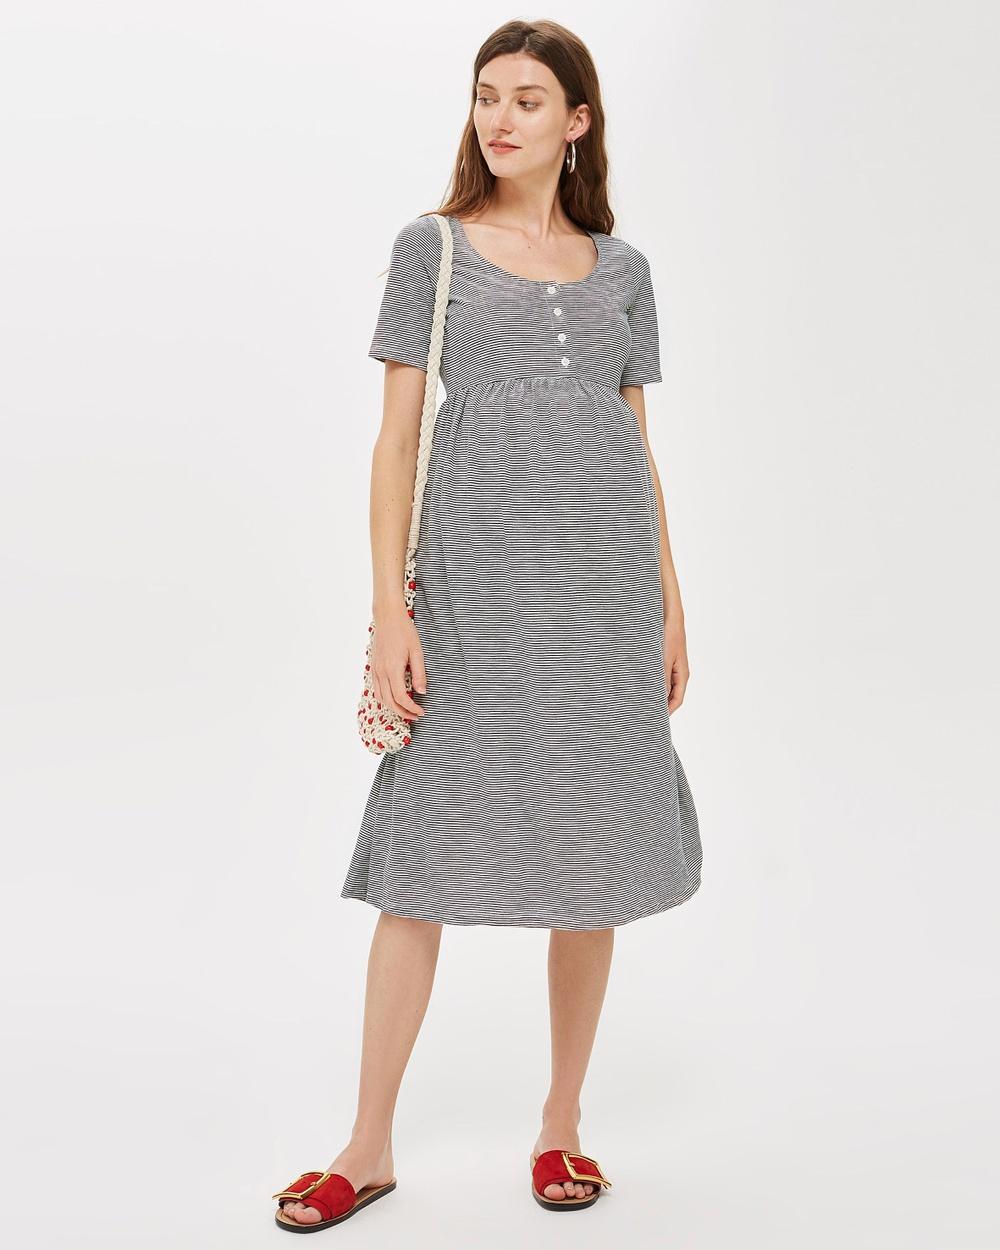 TOPSHOP Maternity Striped Smock Dress Printed Dresses Navy Blue Striped Smock Dress